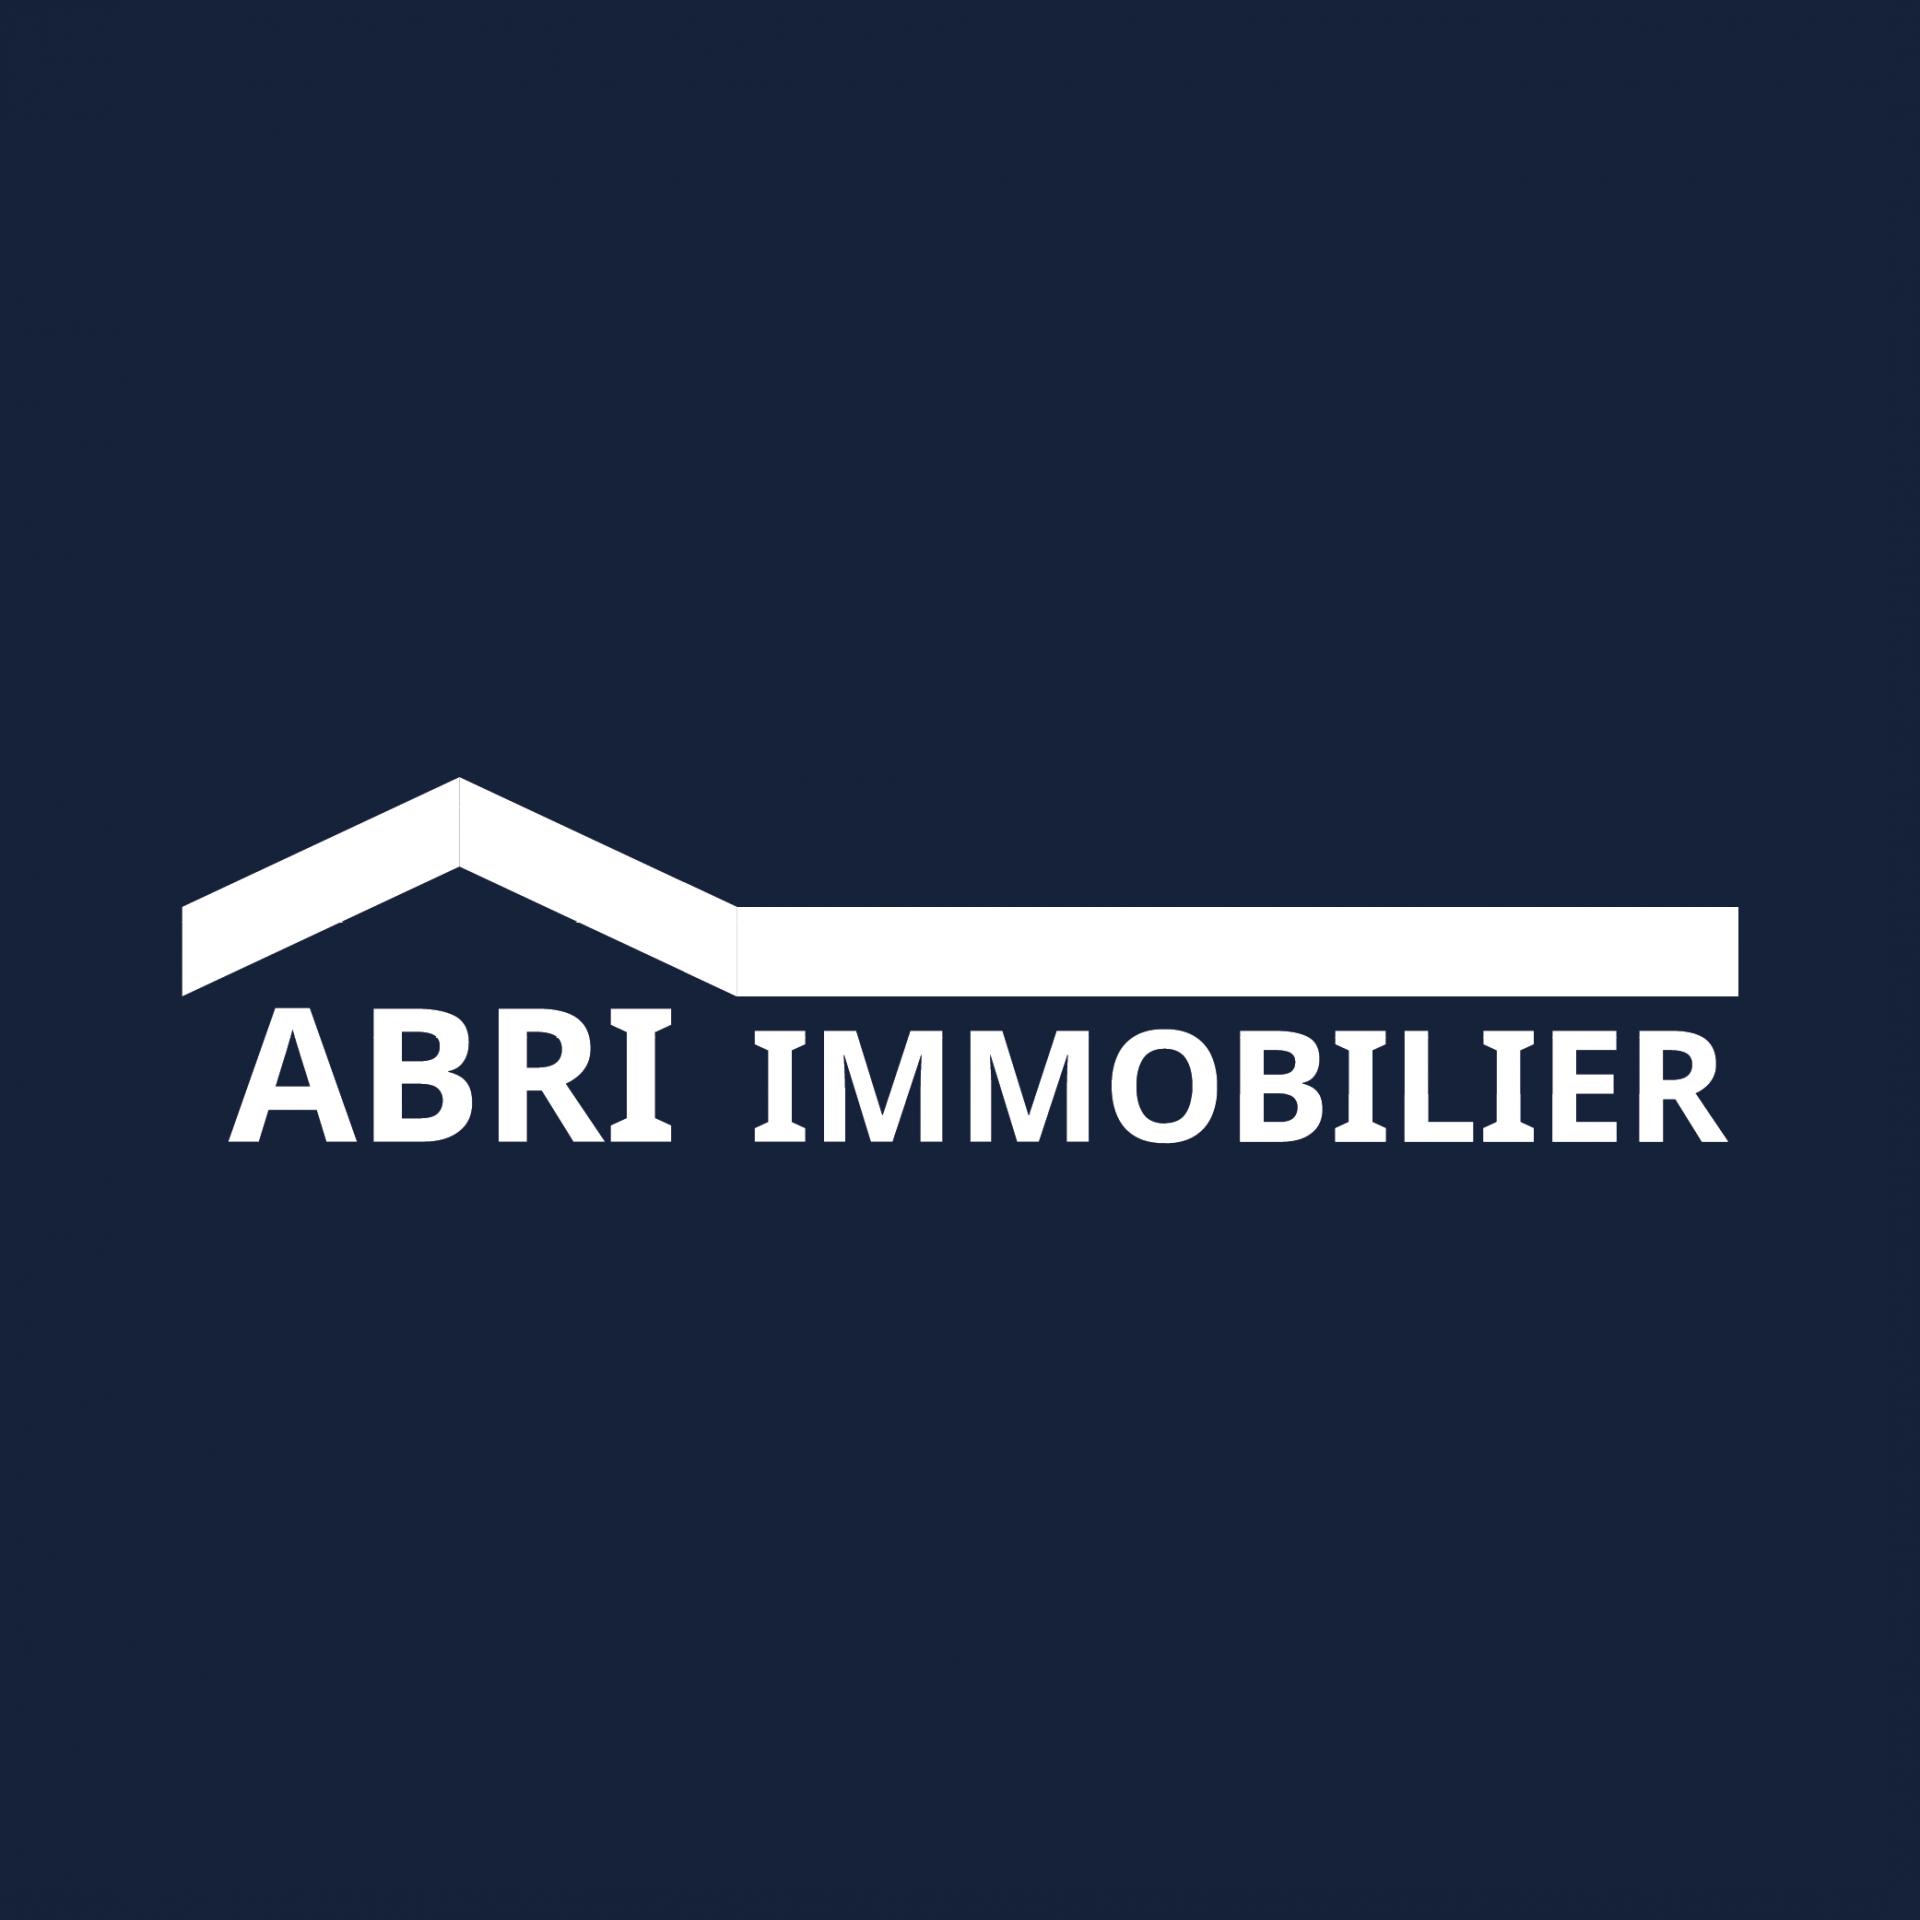 ABRI Immobilier